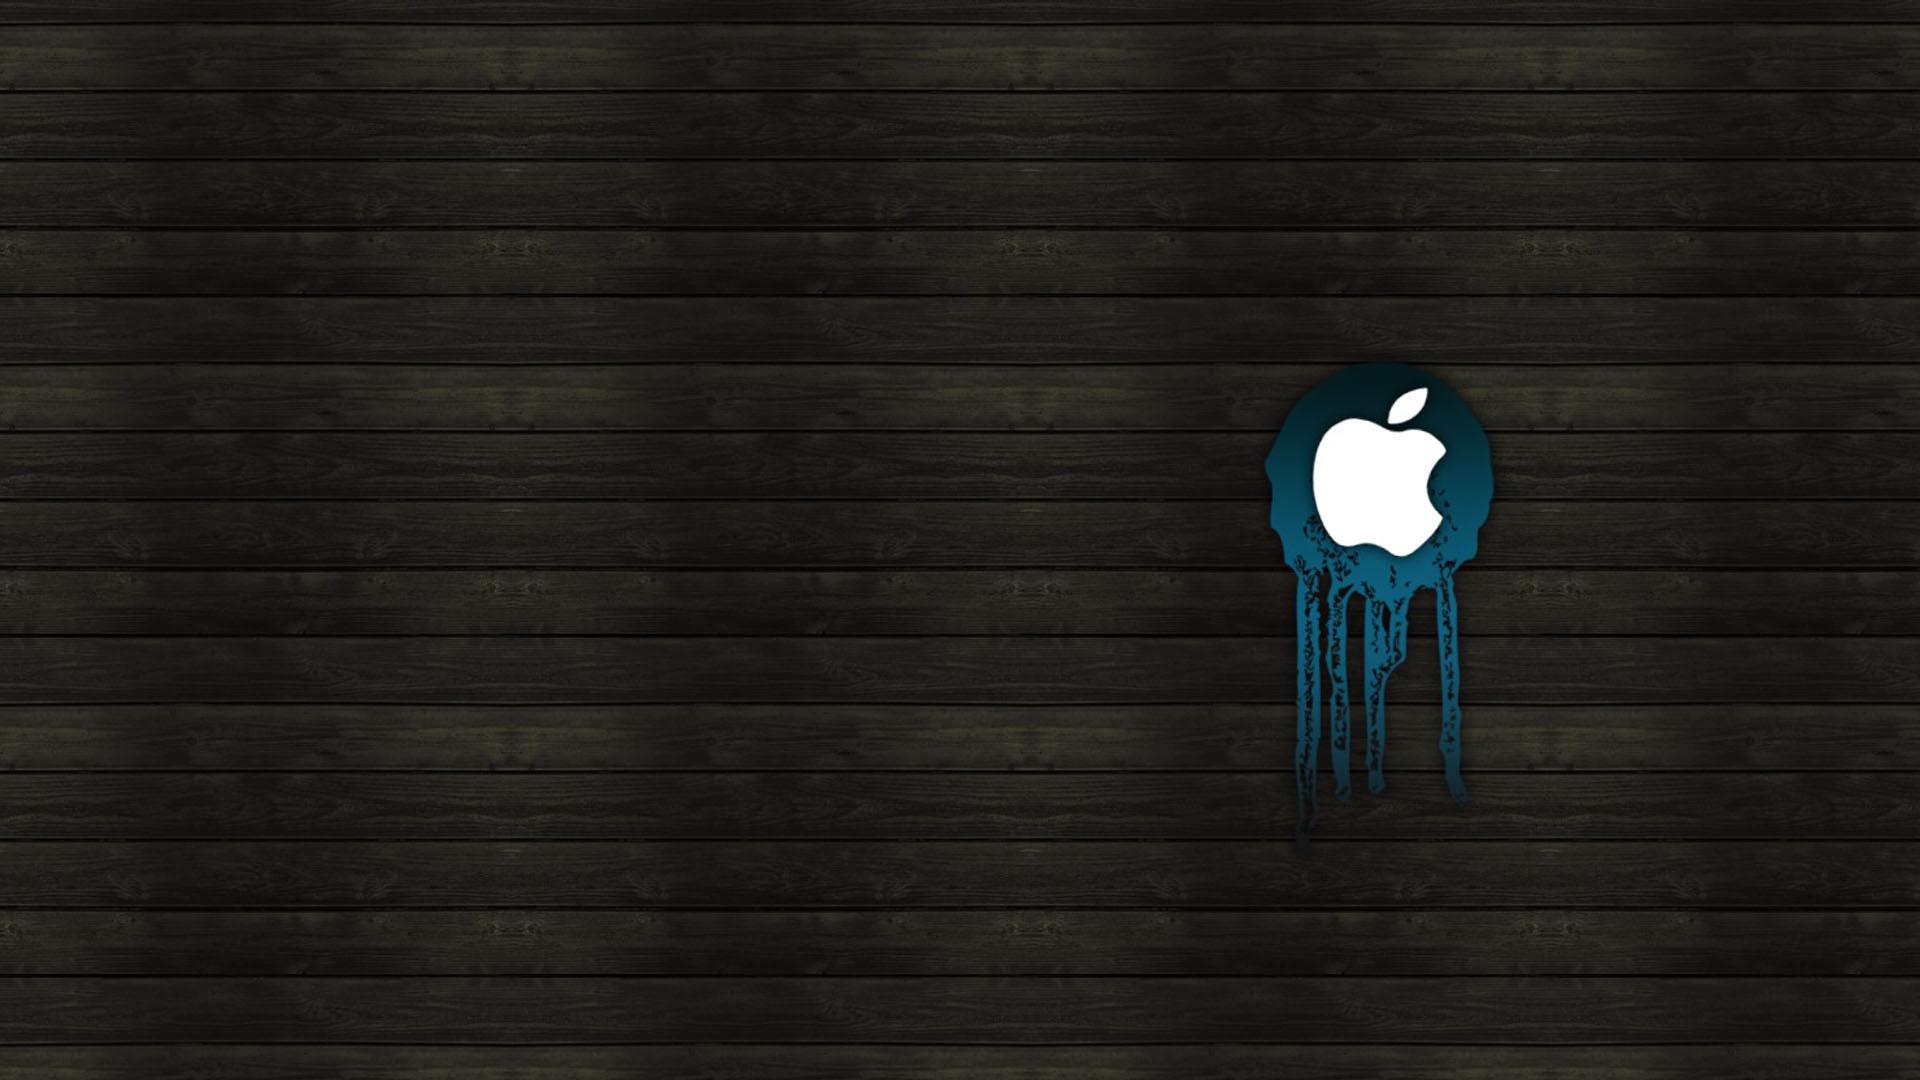 Mac Wallpapers MacBook Pro HD Desktop Wallpapers Visually MacBook Air 1920x1080